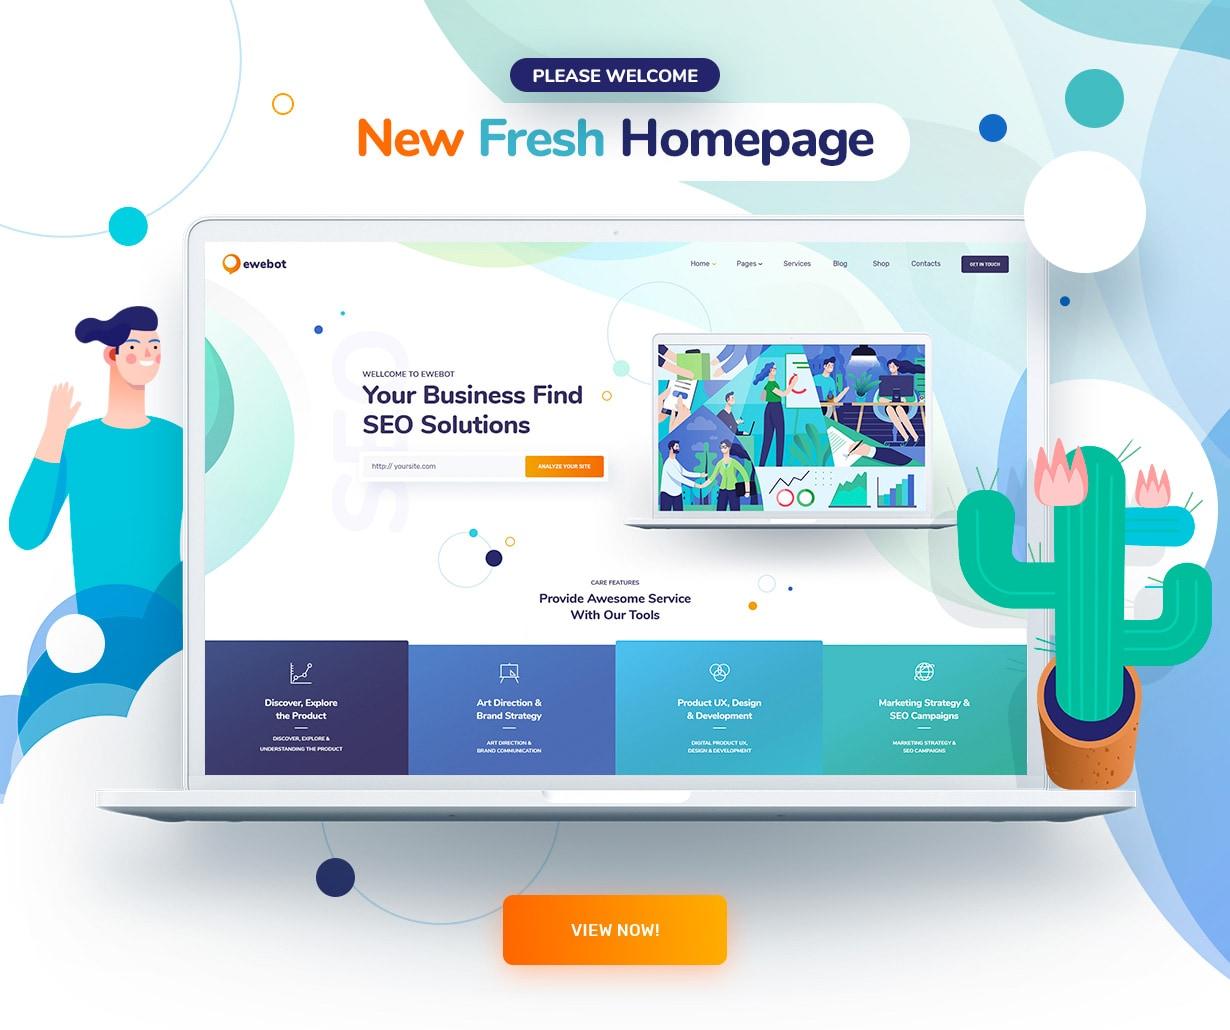 Ewebot - SEO Marketing & Digital Agency - 2